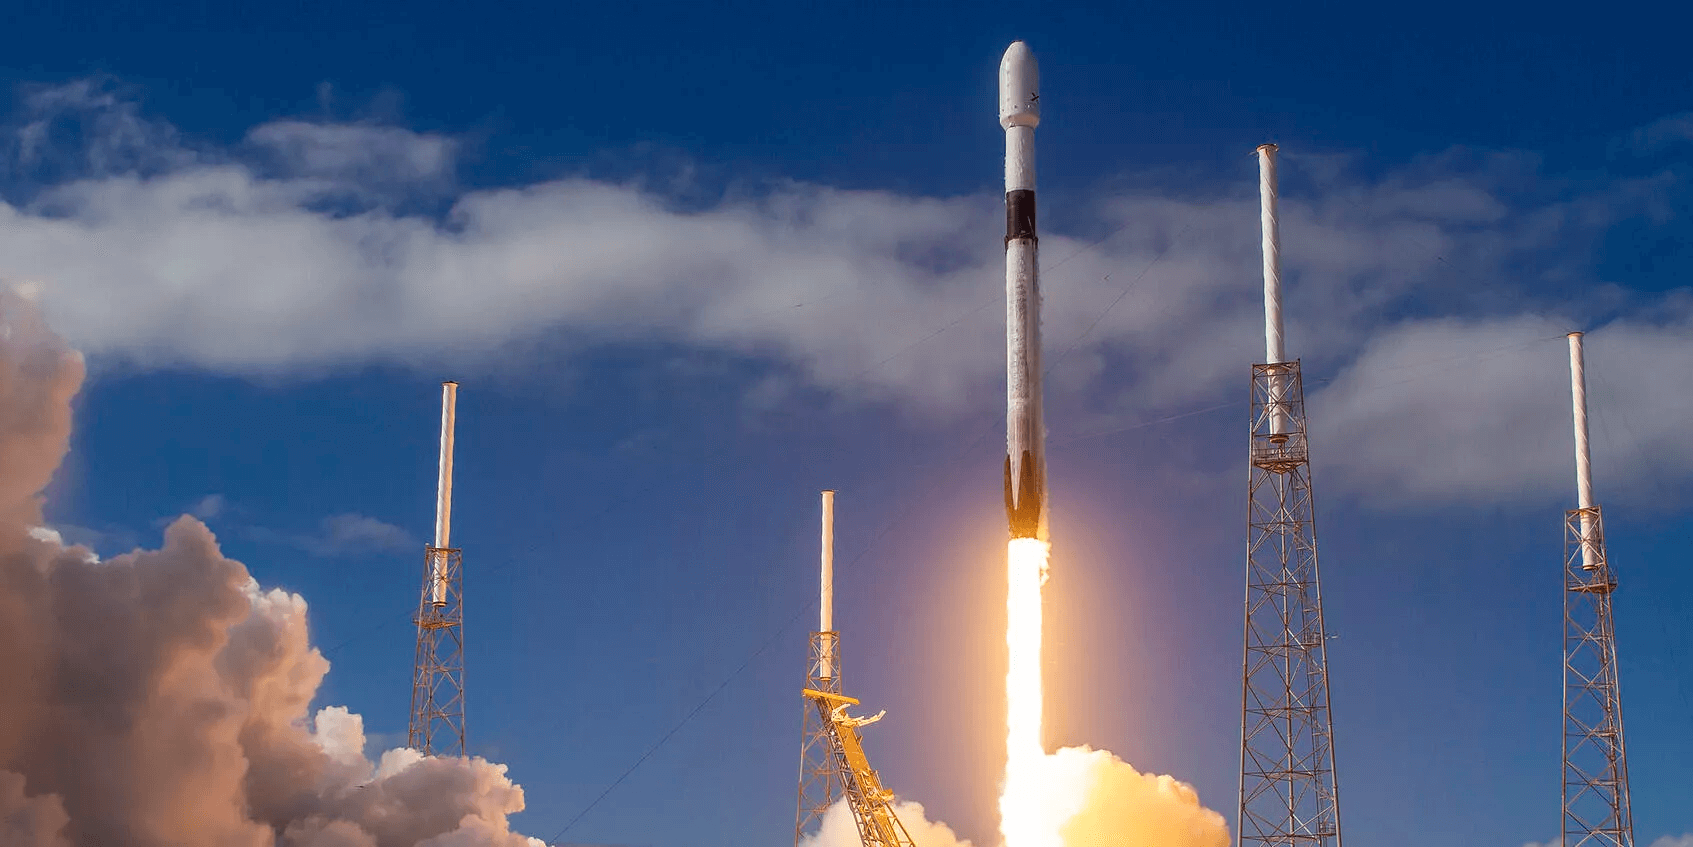 Starlink internet satellitare Sapce X Elon Musk